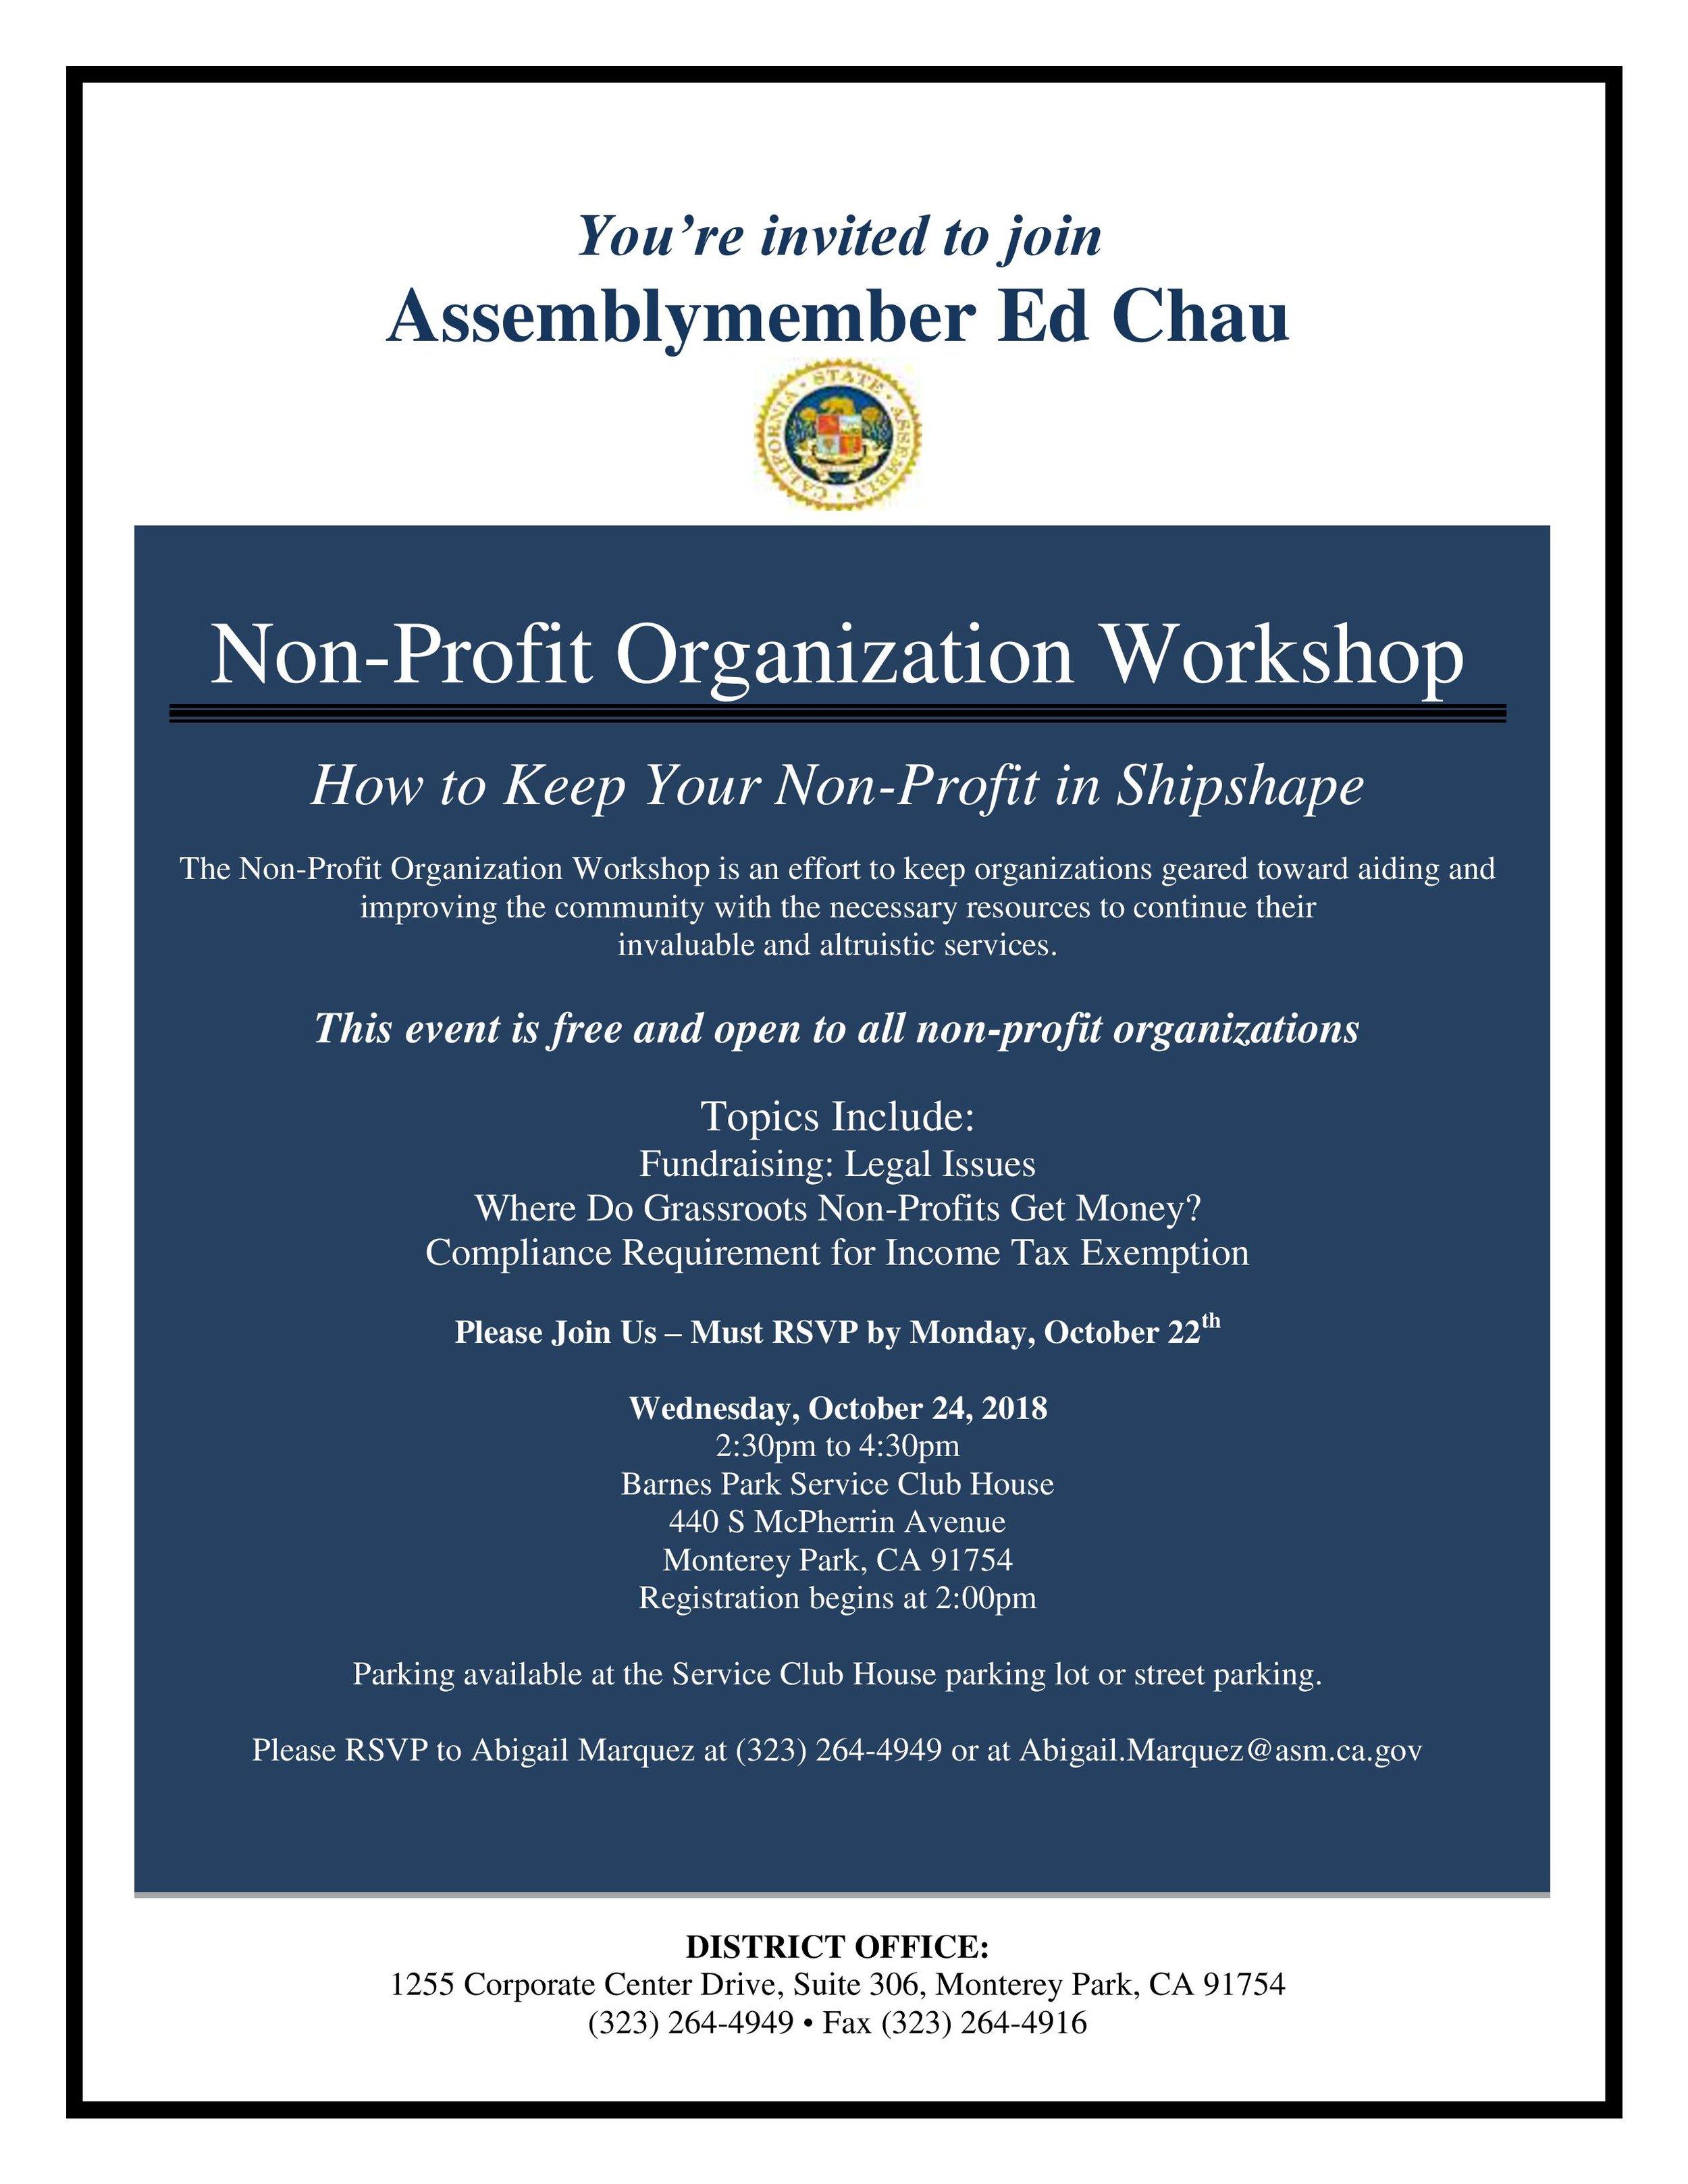 Assemblymember ed chau: non-profit organization workshop - October 24th, 2018